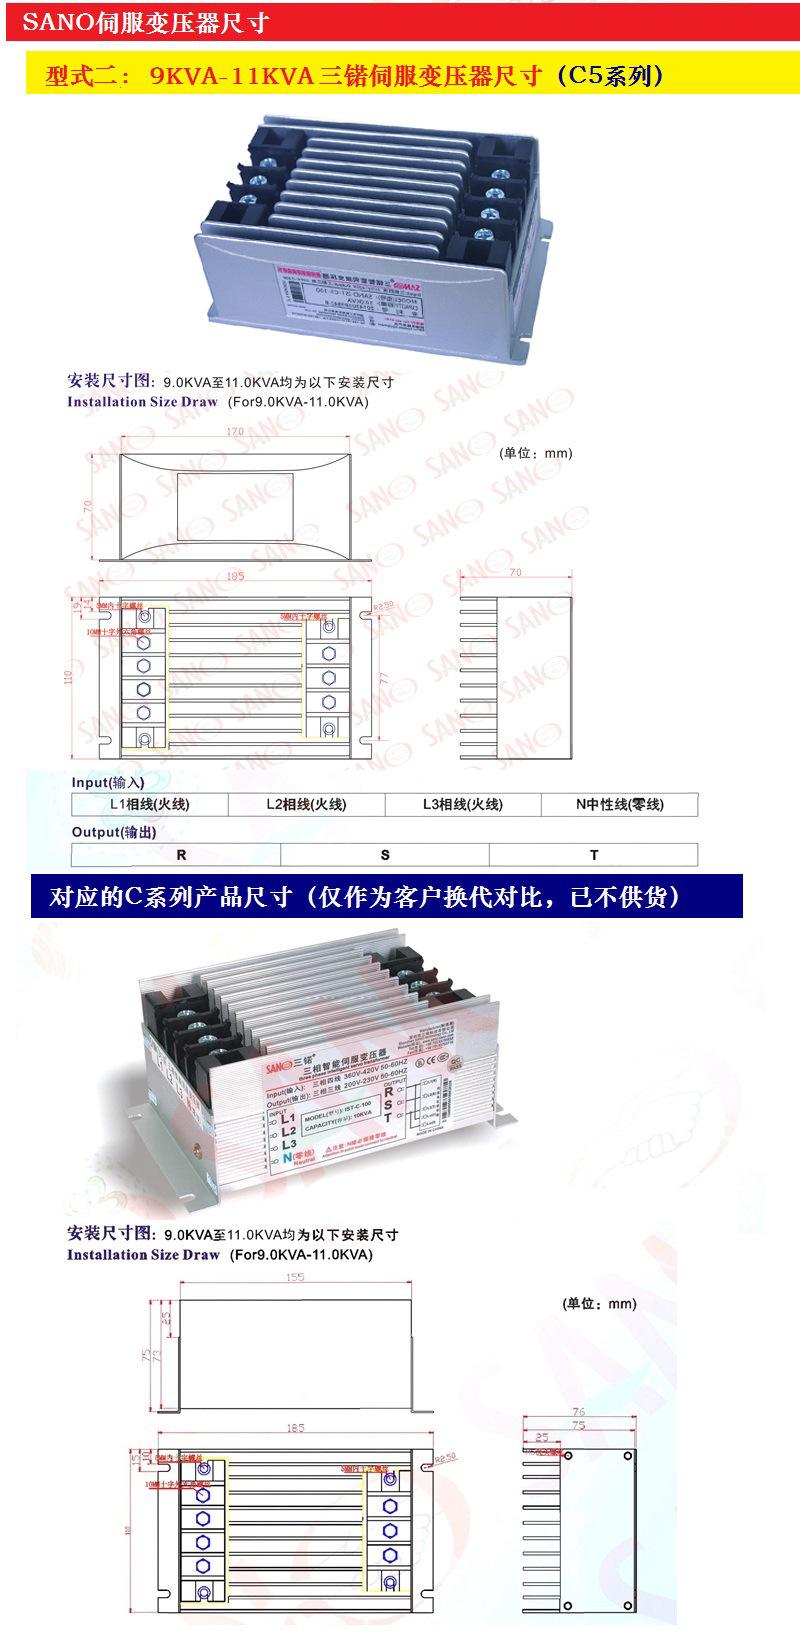 IST-C5-005伺服变压器0.5KVA三锘SANO伺服电子变压器380V转200V示例图4